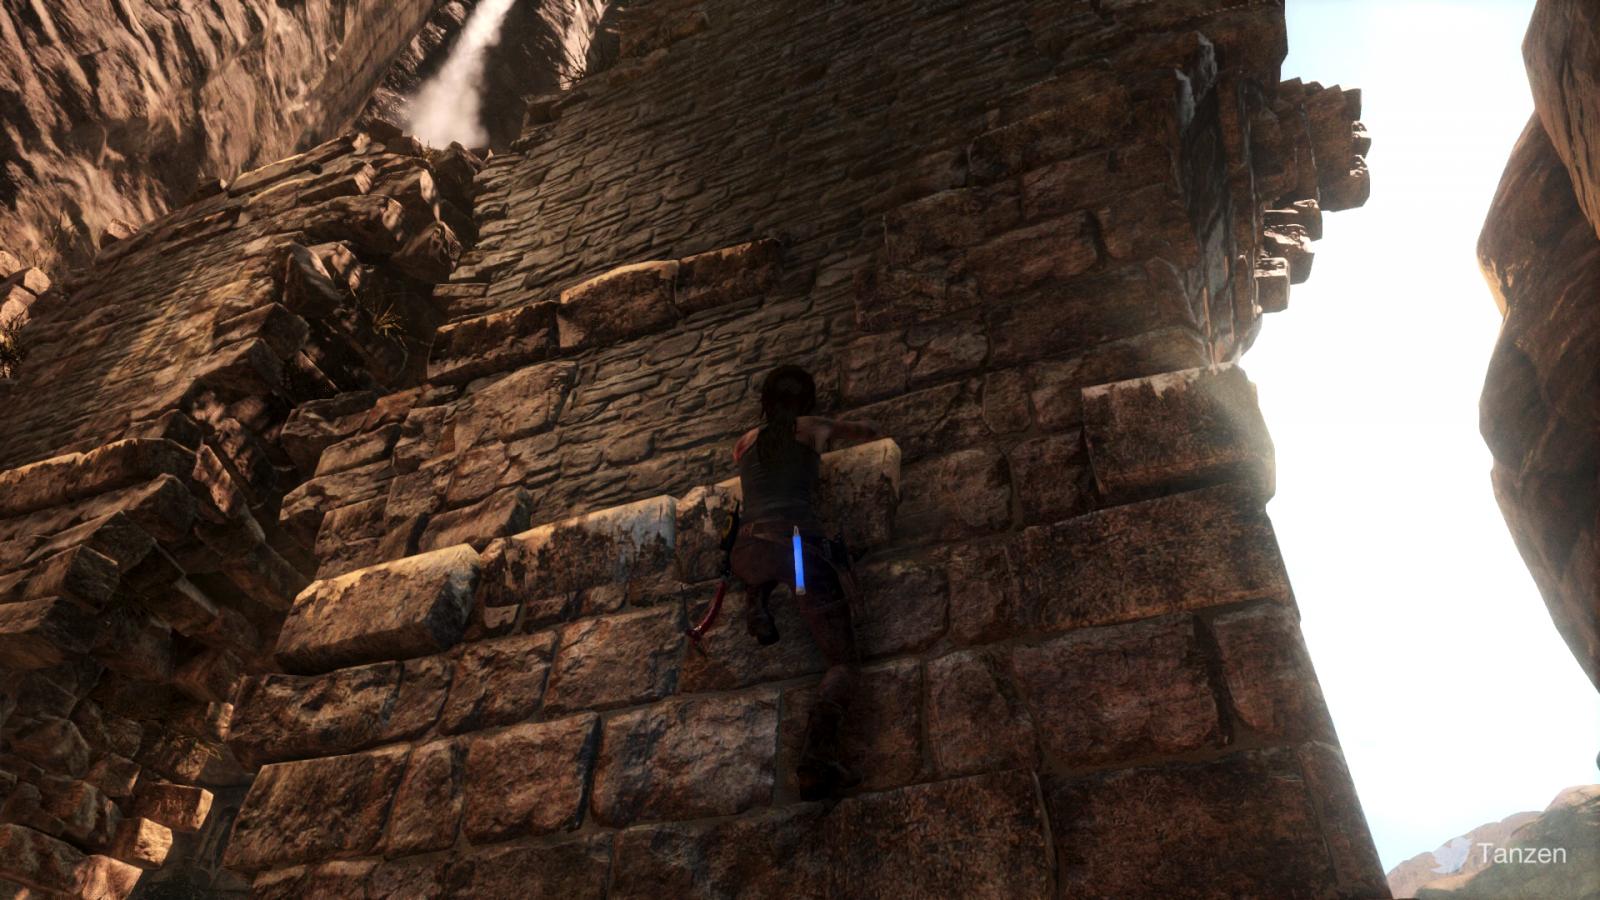 Rise of the Tomb Raider Screen Shot 09.11.15 20. 21_watermark